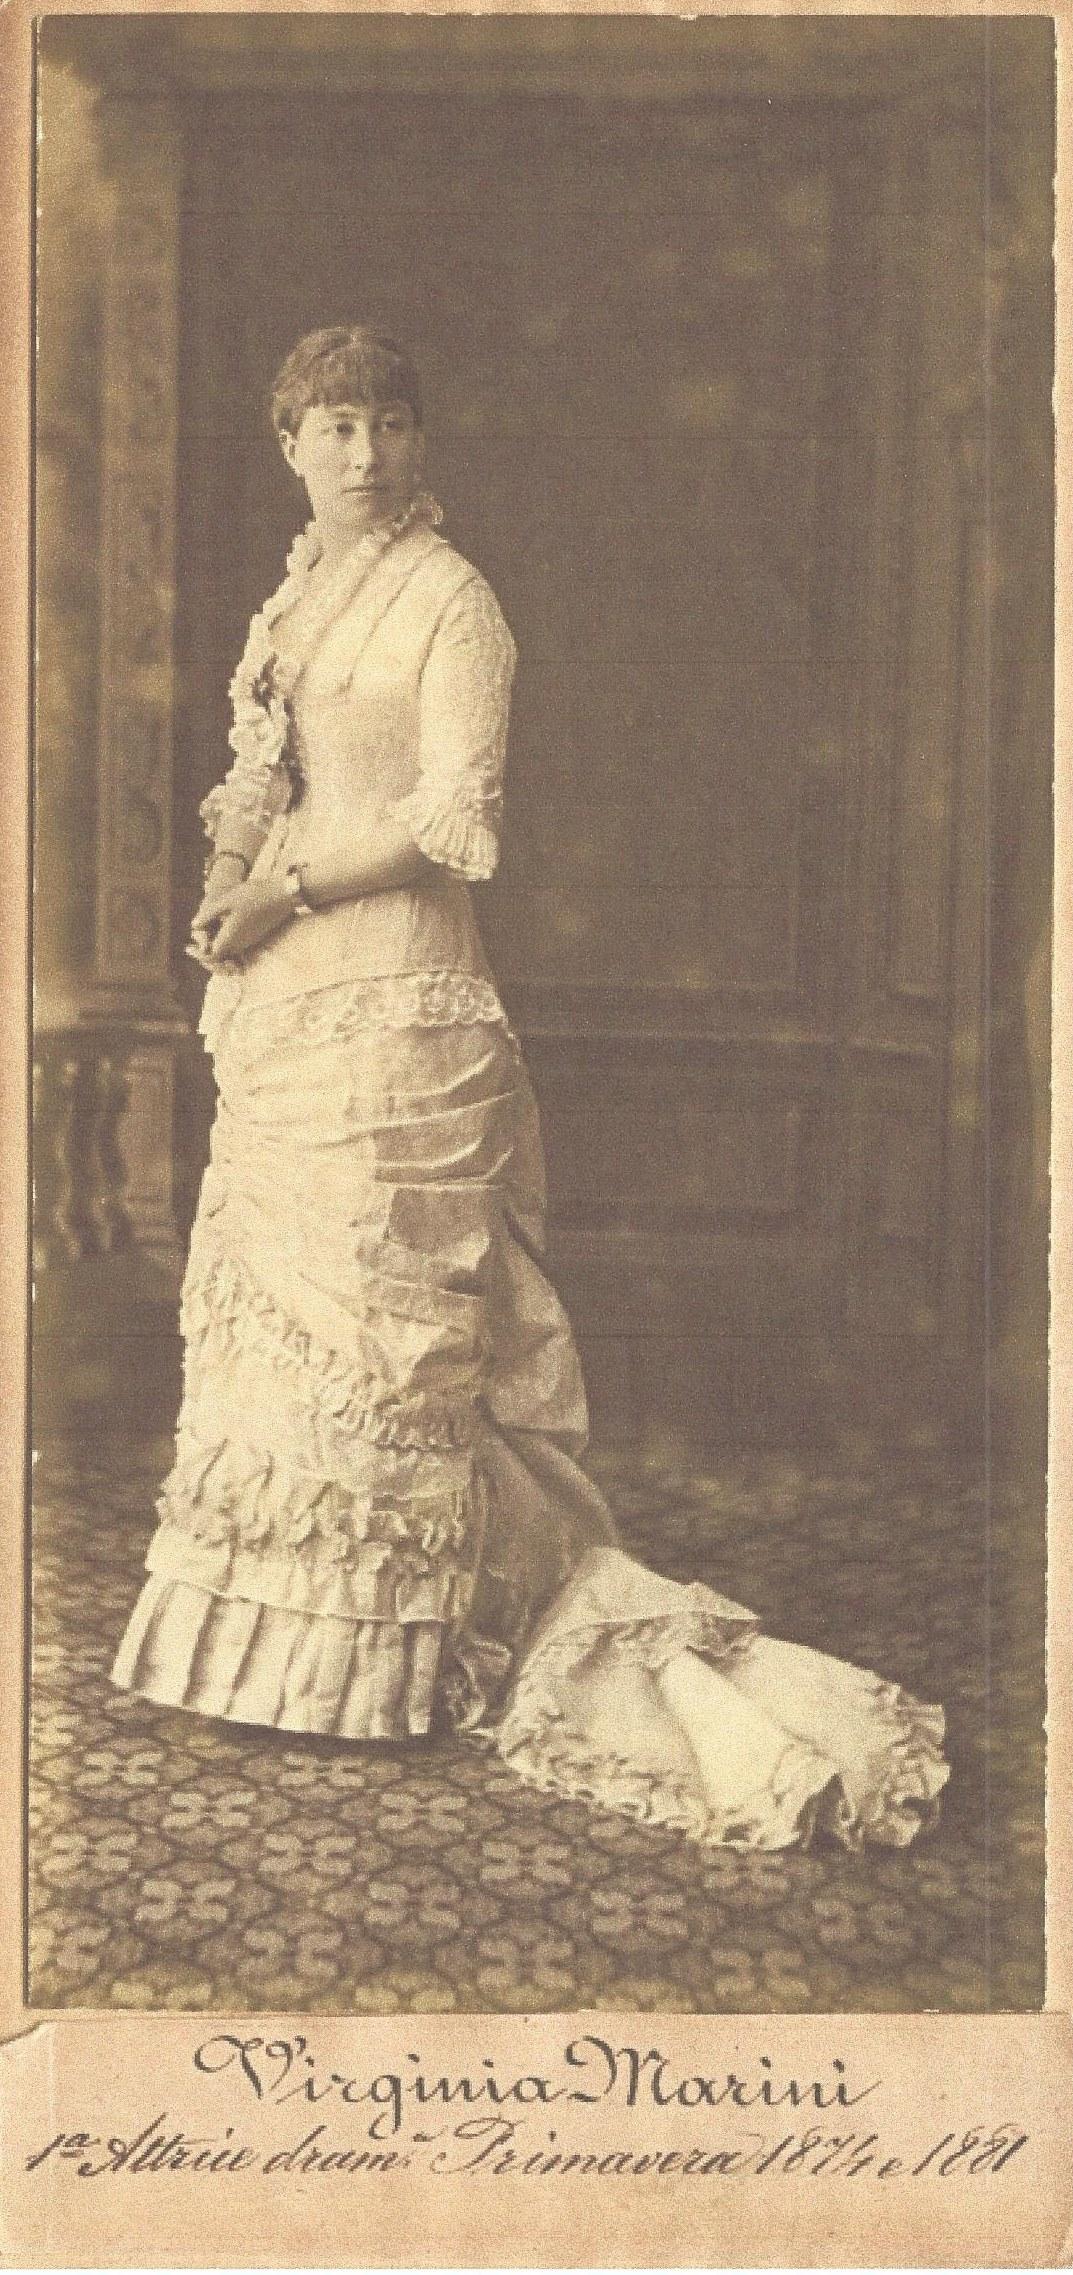 Segnalibro Virginia Marini